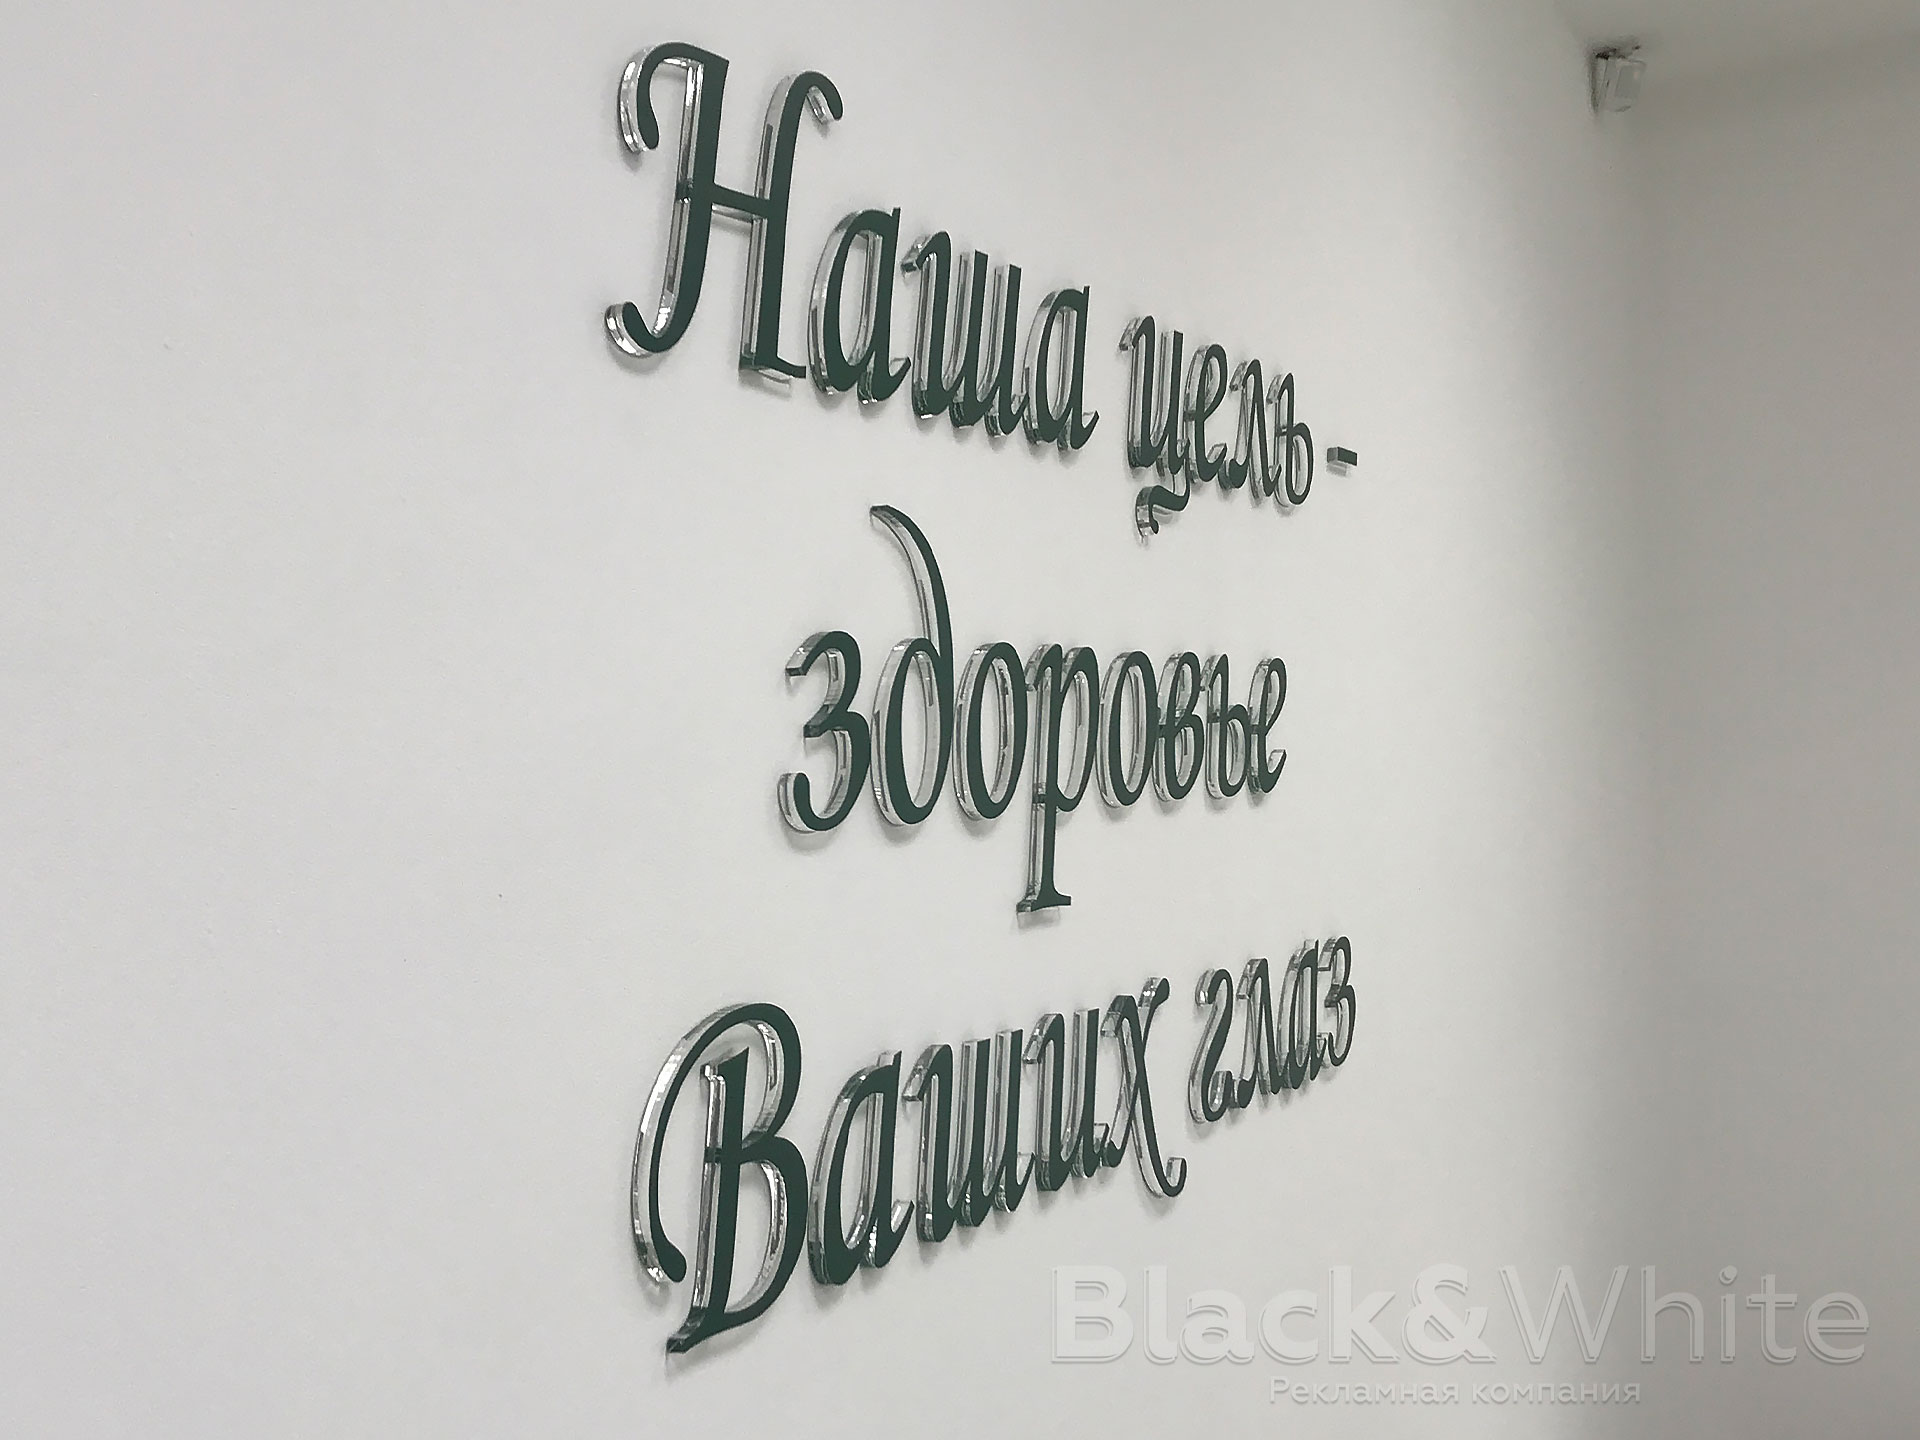 Плоские-(псевдообъемные)-буквы-из-оргстекла-акрила-bukvyi-ploskie-psevdoobemnyie-bukvyi-iz-orgstekla-Black&White..jpg